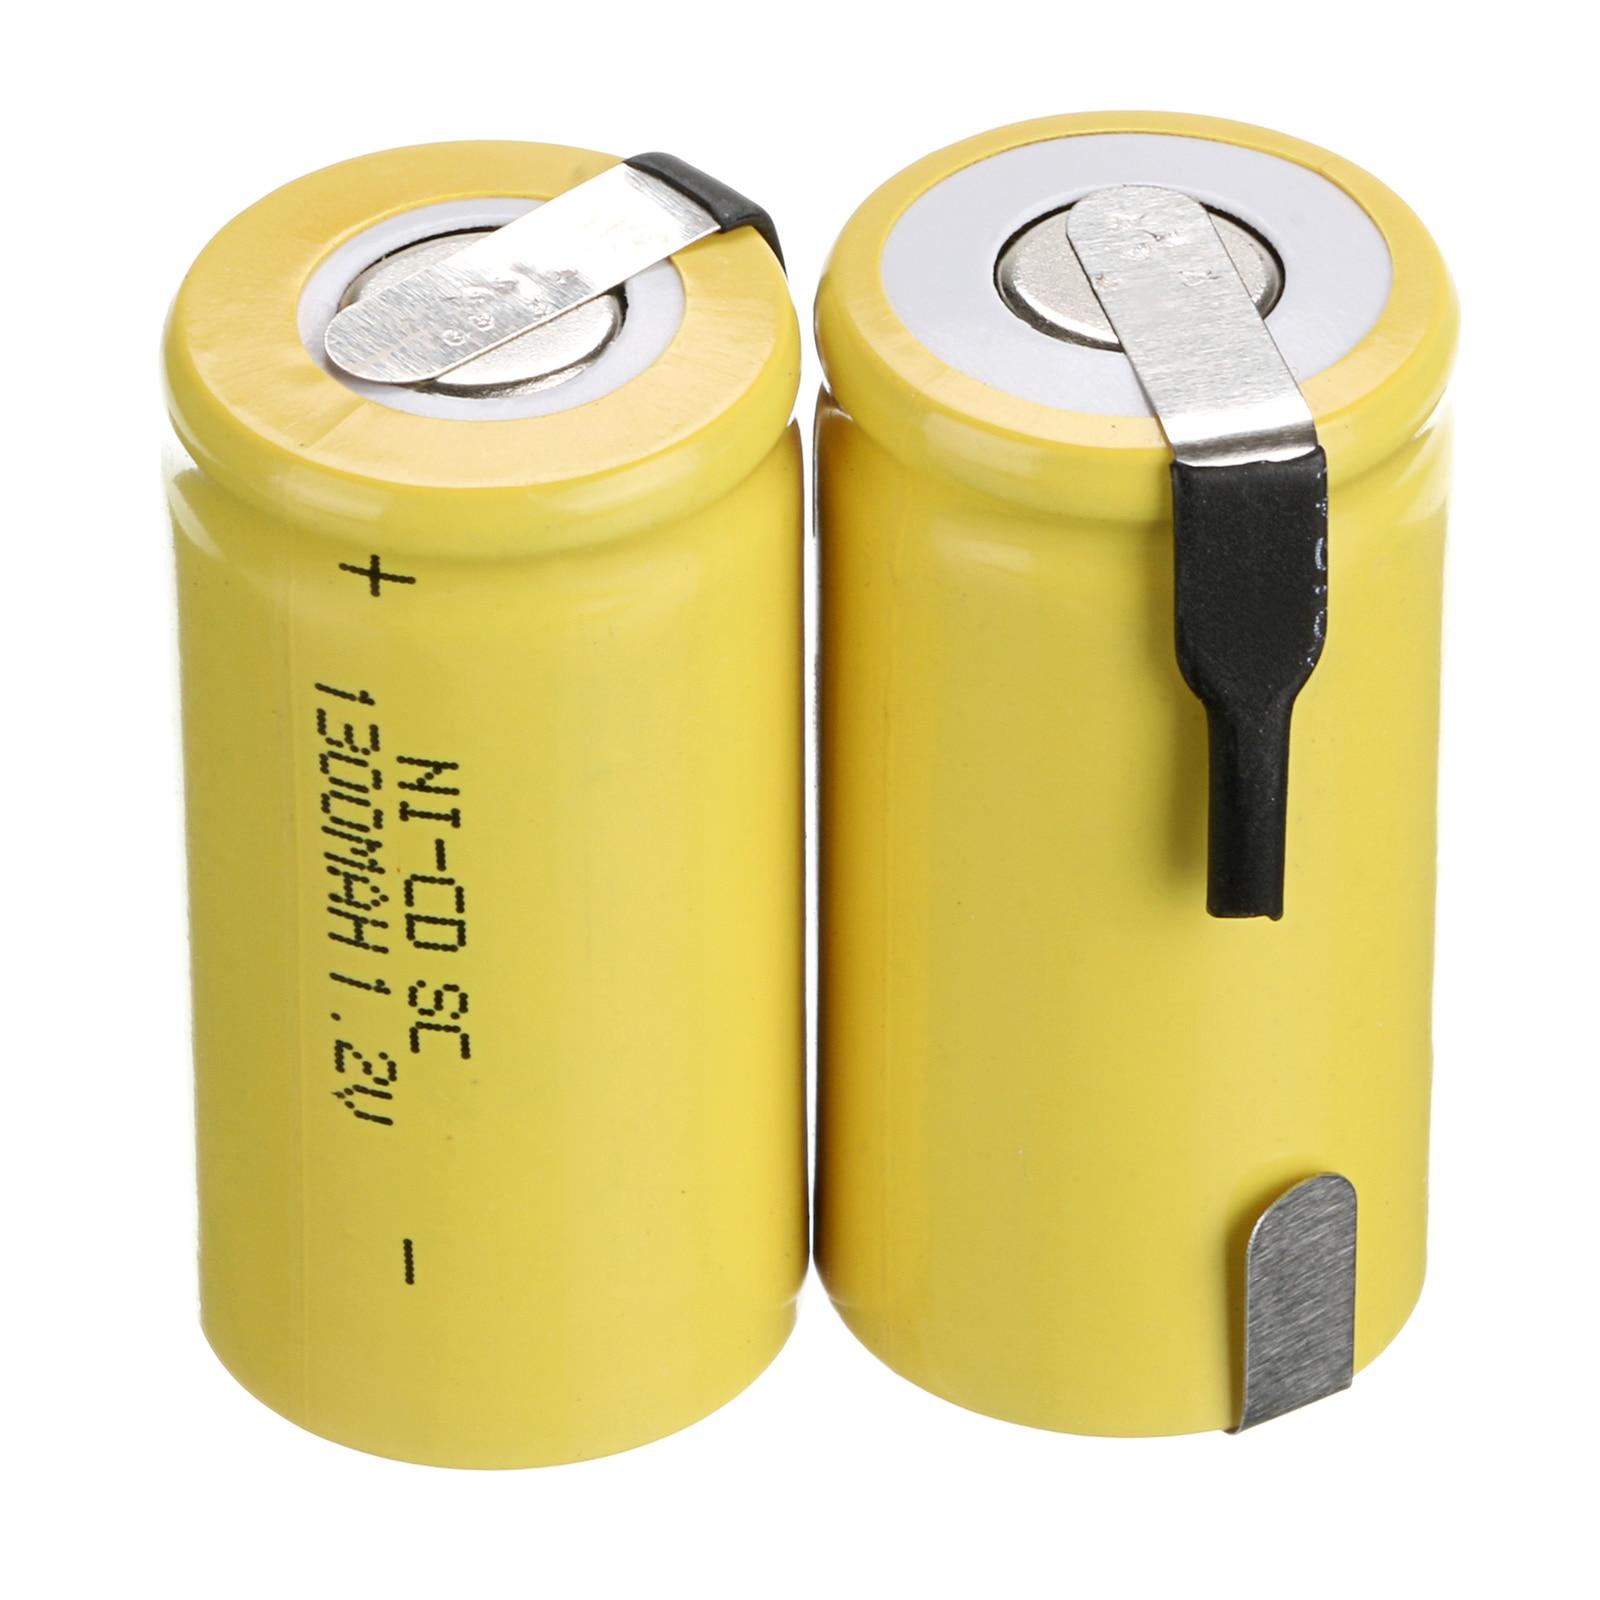 2 ~ 16 шт 1300mAh nicd 1,2 v батарея sub c sc 1,2 v ni cd ni cd аккумуляторы желтый Перезаряжаемые батареи      АлиЭкспресс